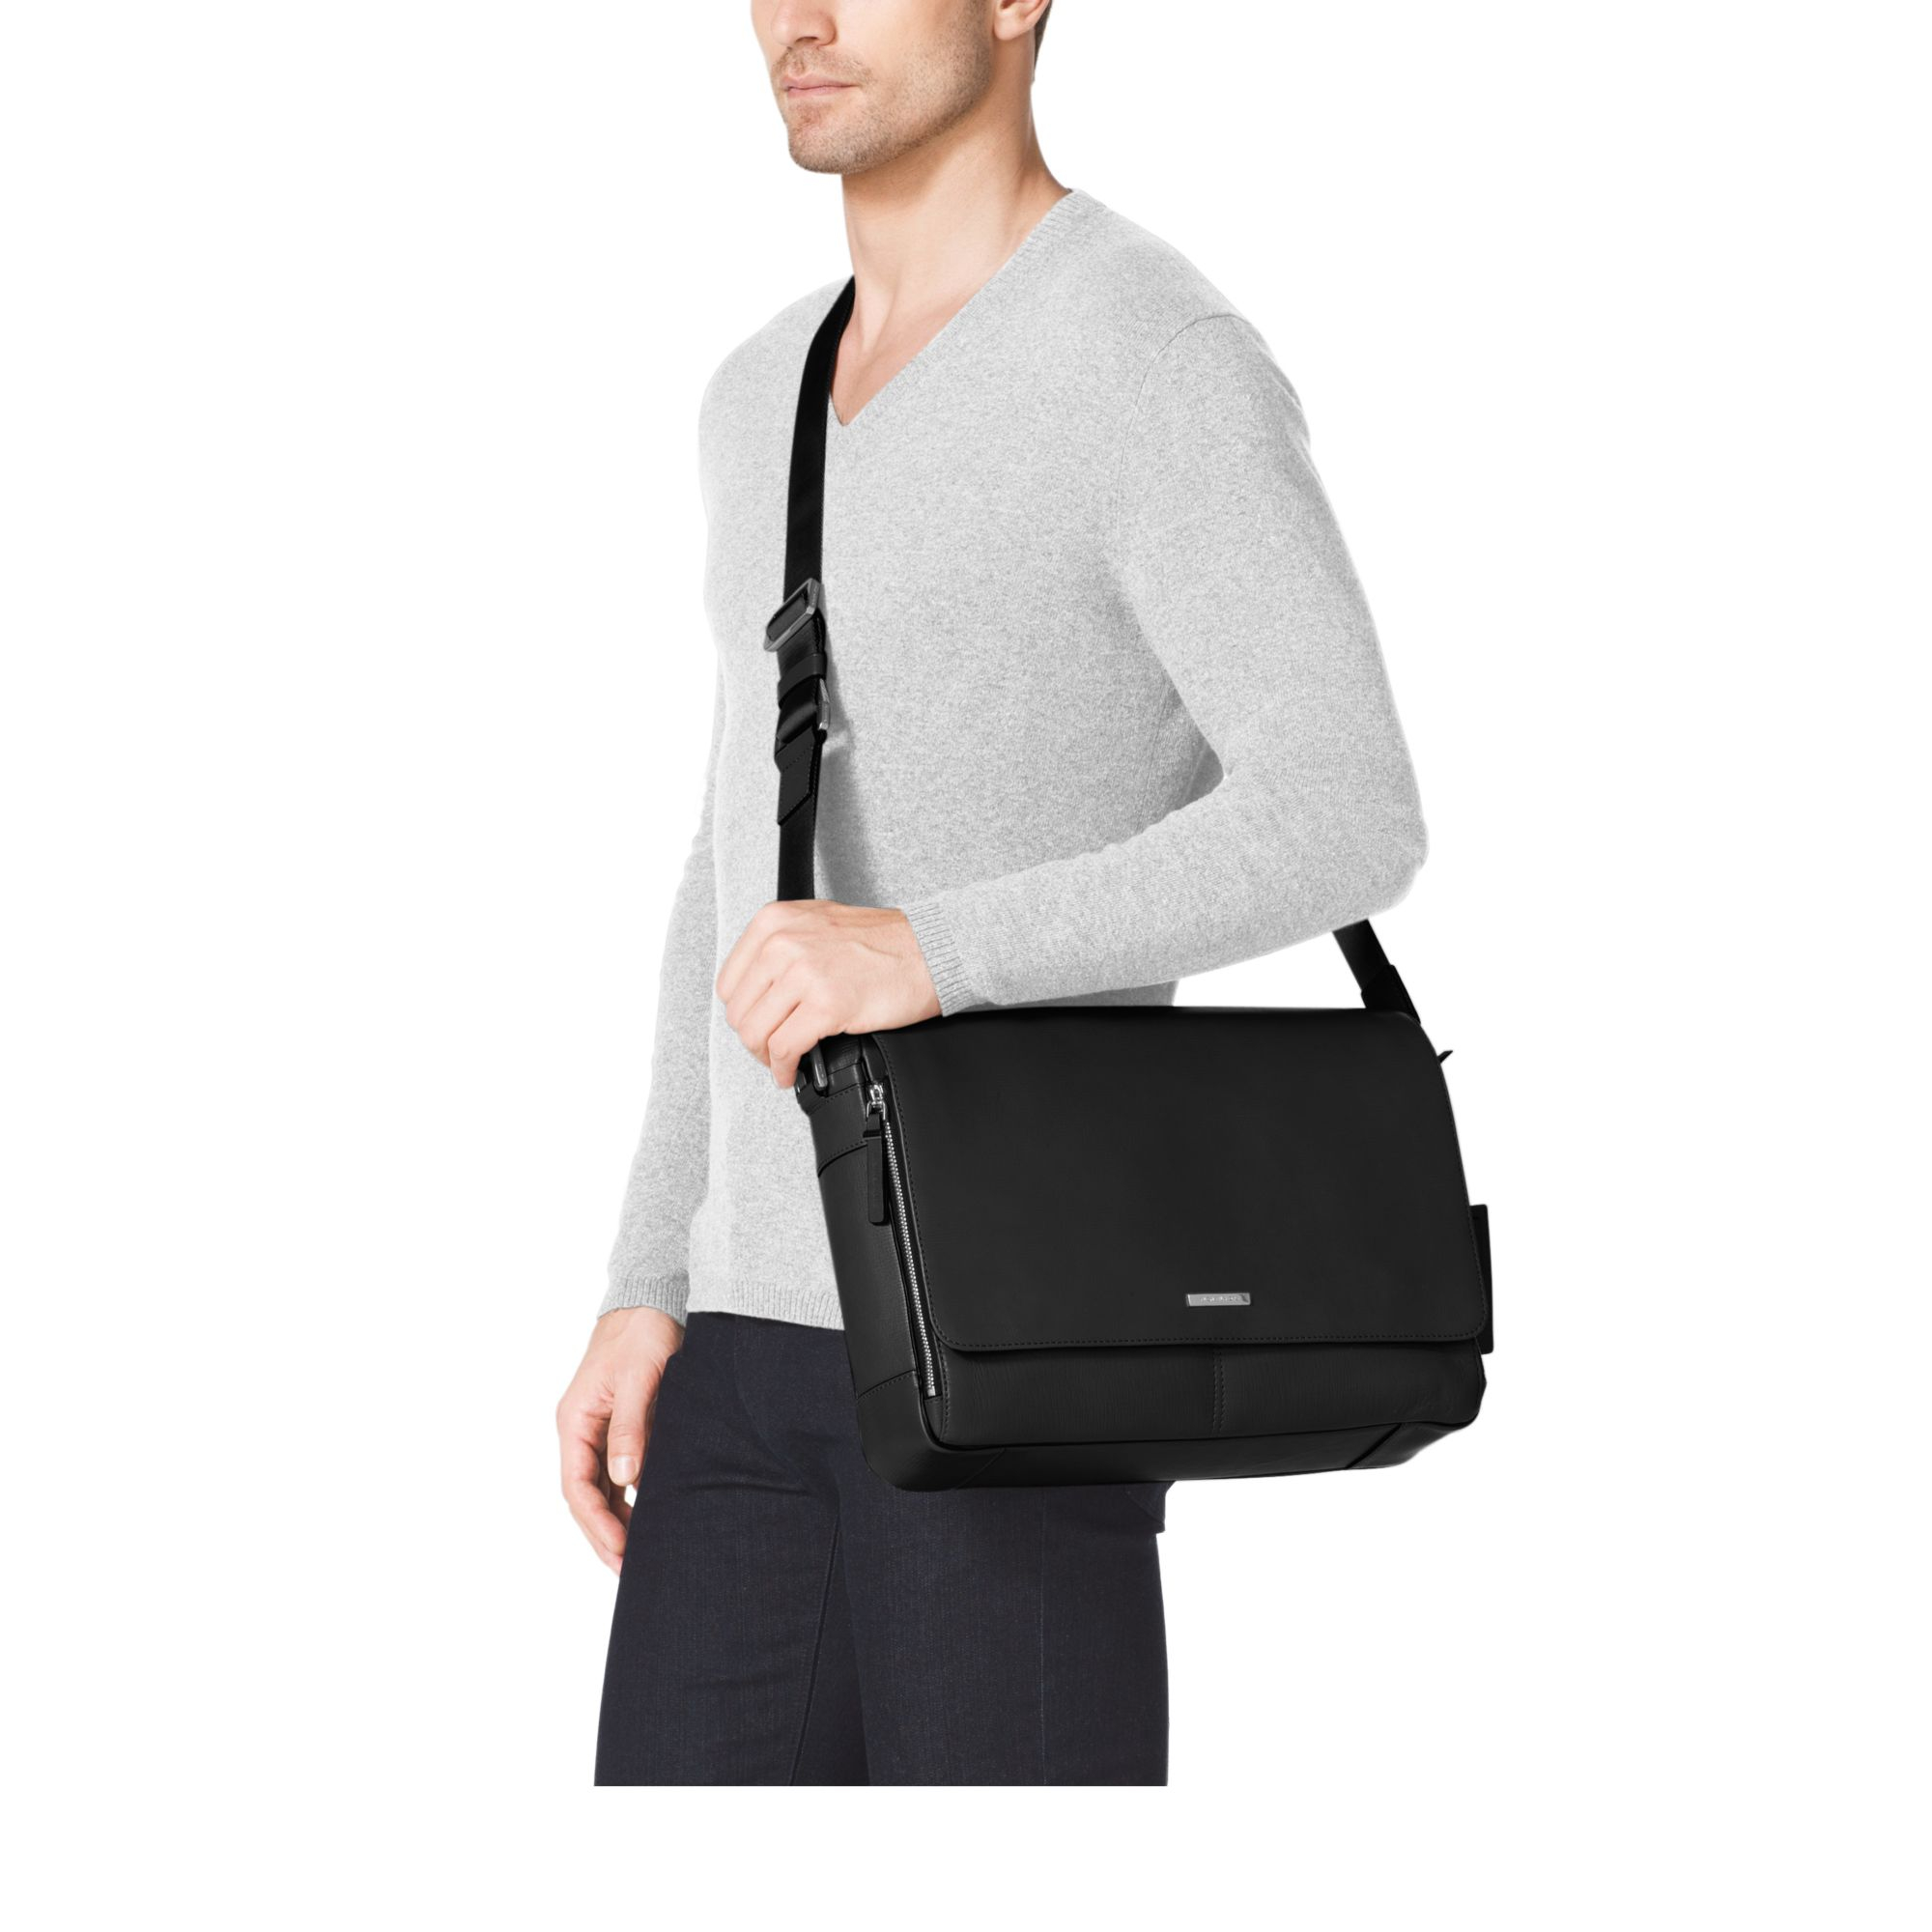 2a65dcb467ca Lyst - Michael Kors Warren Large Leather Messenger in Black for Men